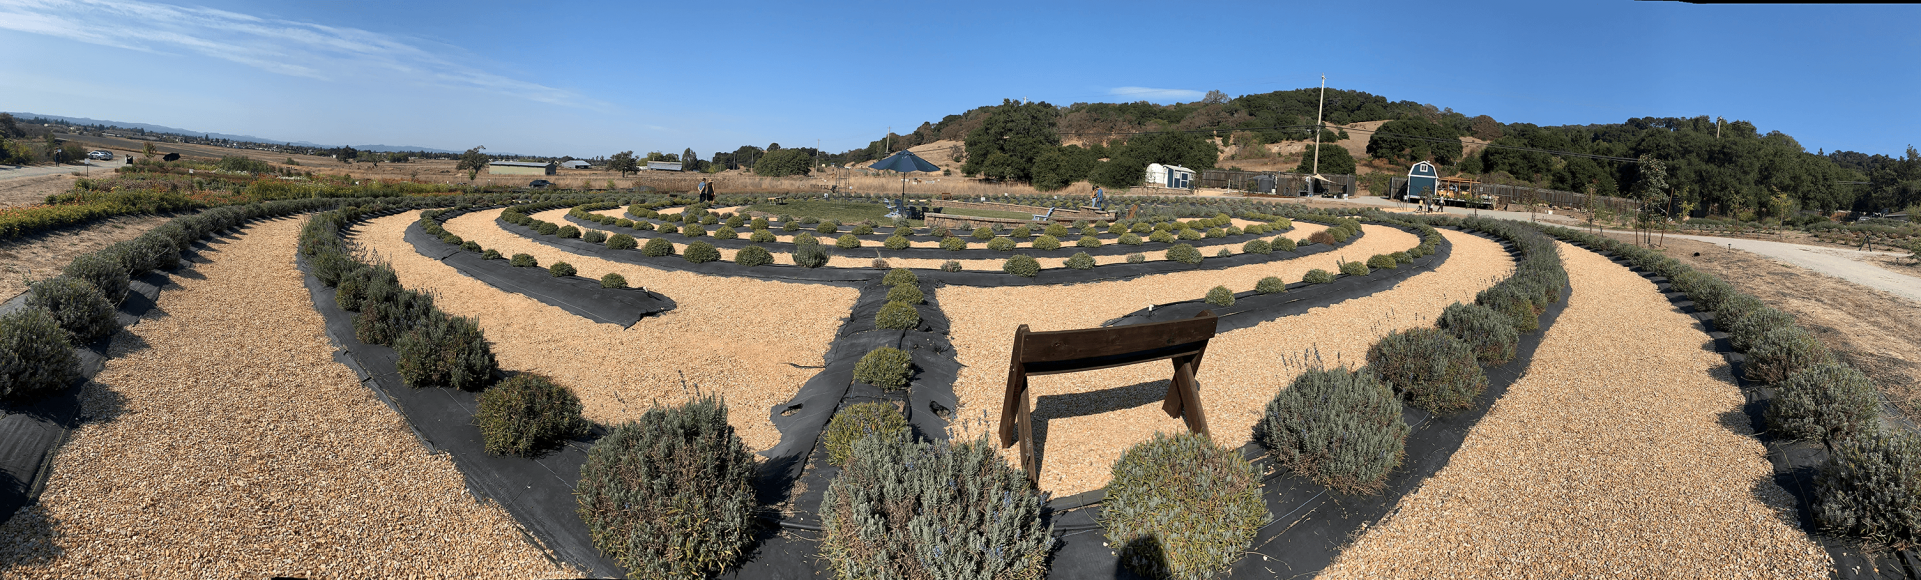 A panorama captures an organic lavender labyrinth on Sunday, Oct 13, 2019 at BeesNBlooms Farm in Santa Rosa, Calif. (Salma Loum/ Peninsula Press)